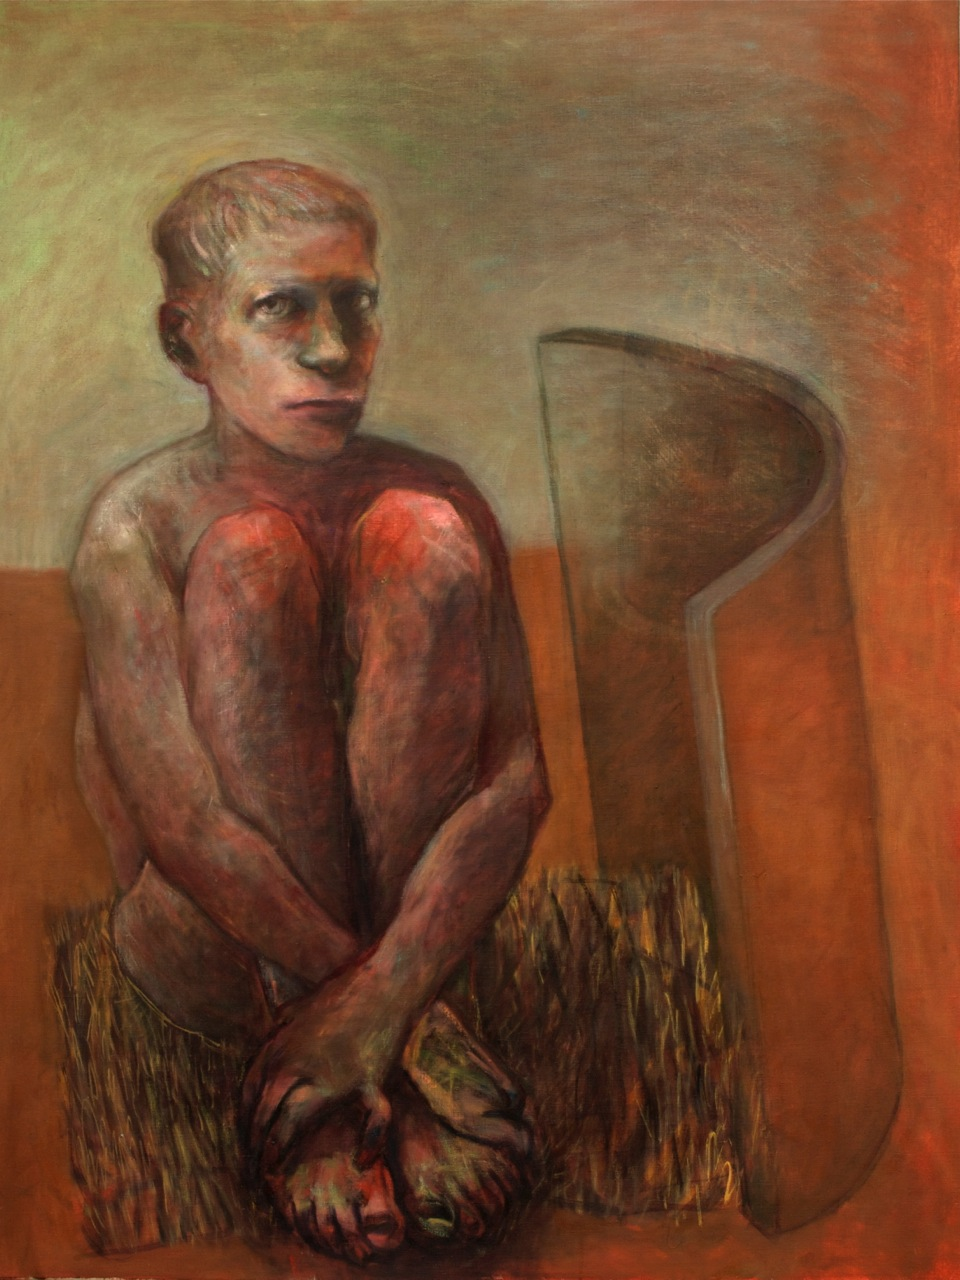 Warrior 1, 2010, Oil on Canvas, 101 x 77 cm